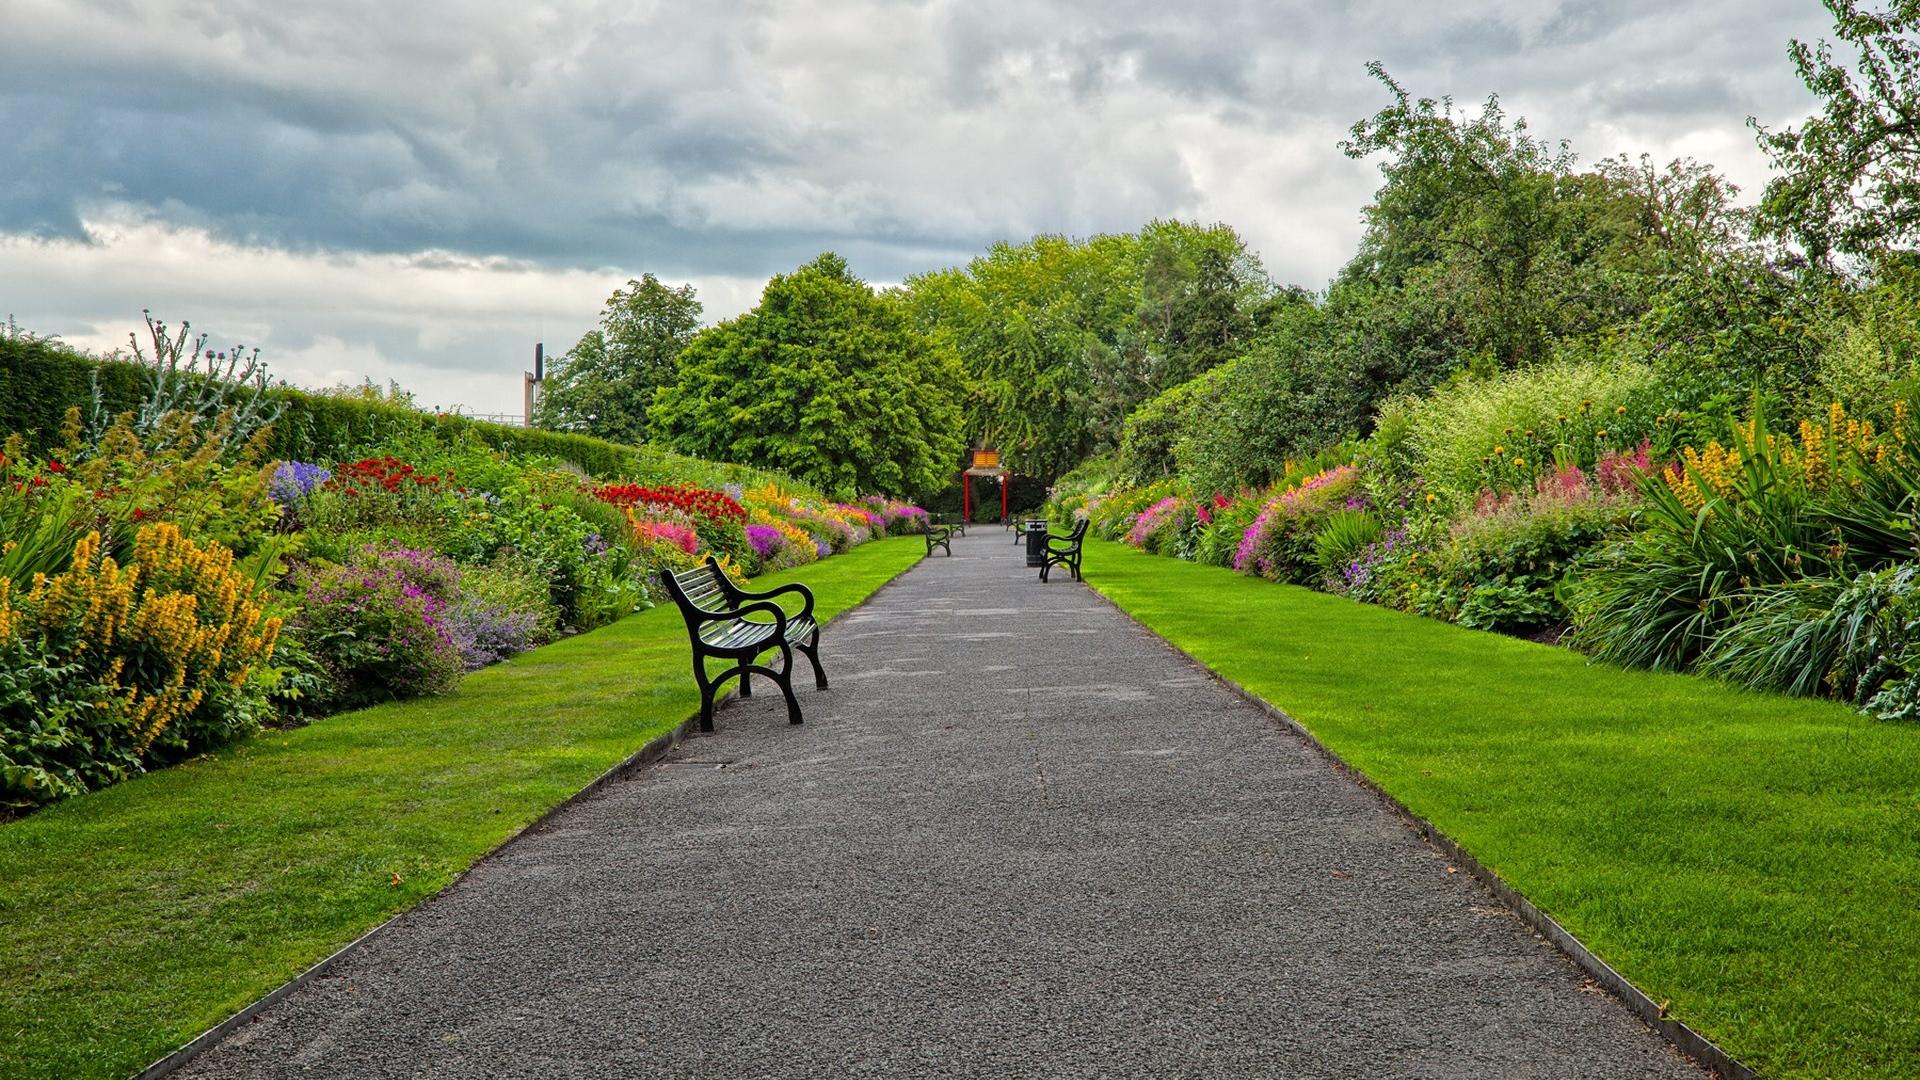 Wallpaper Garden Park Road Benches Landscape   Garden Hd 1920x1080